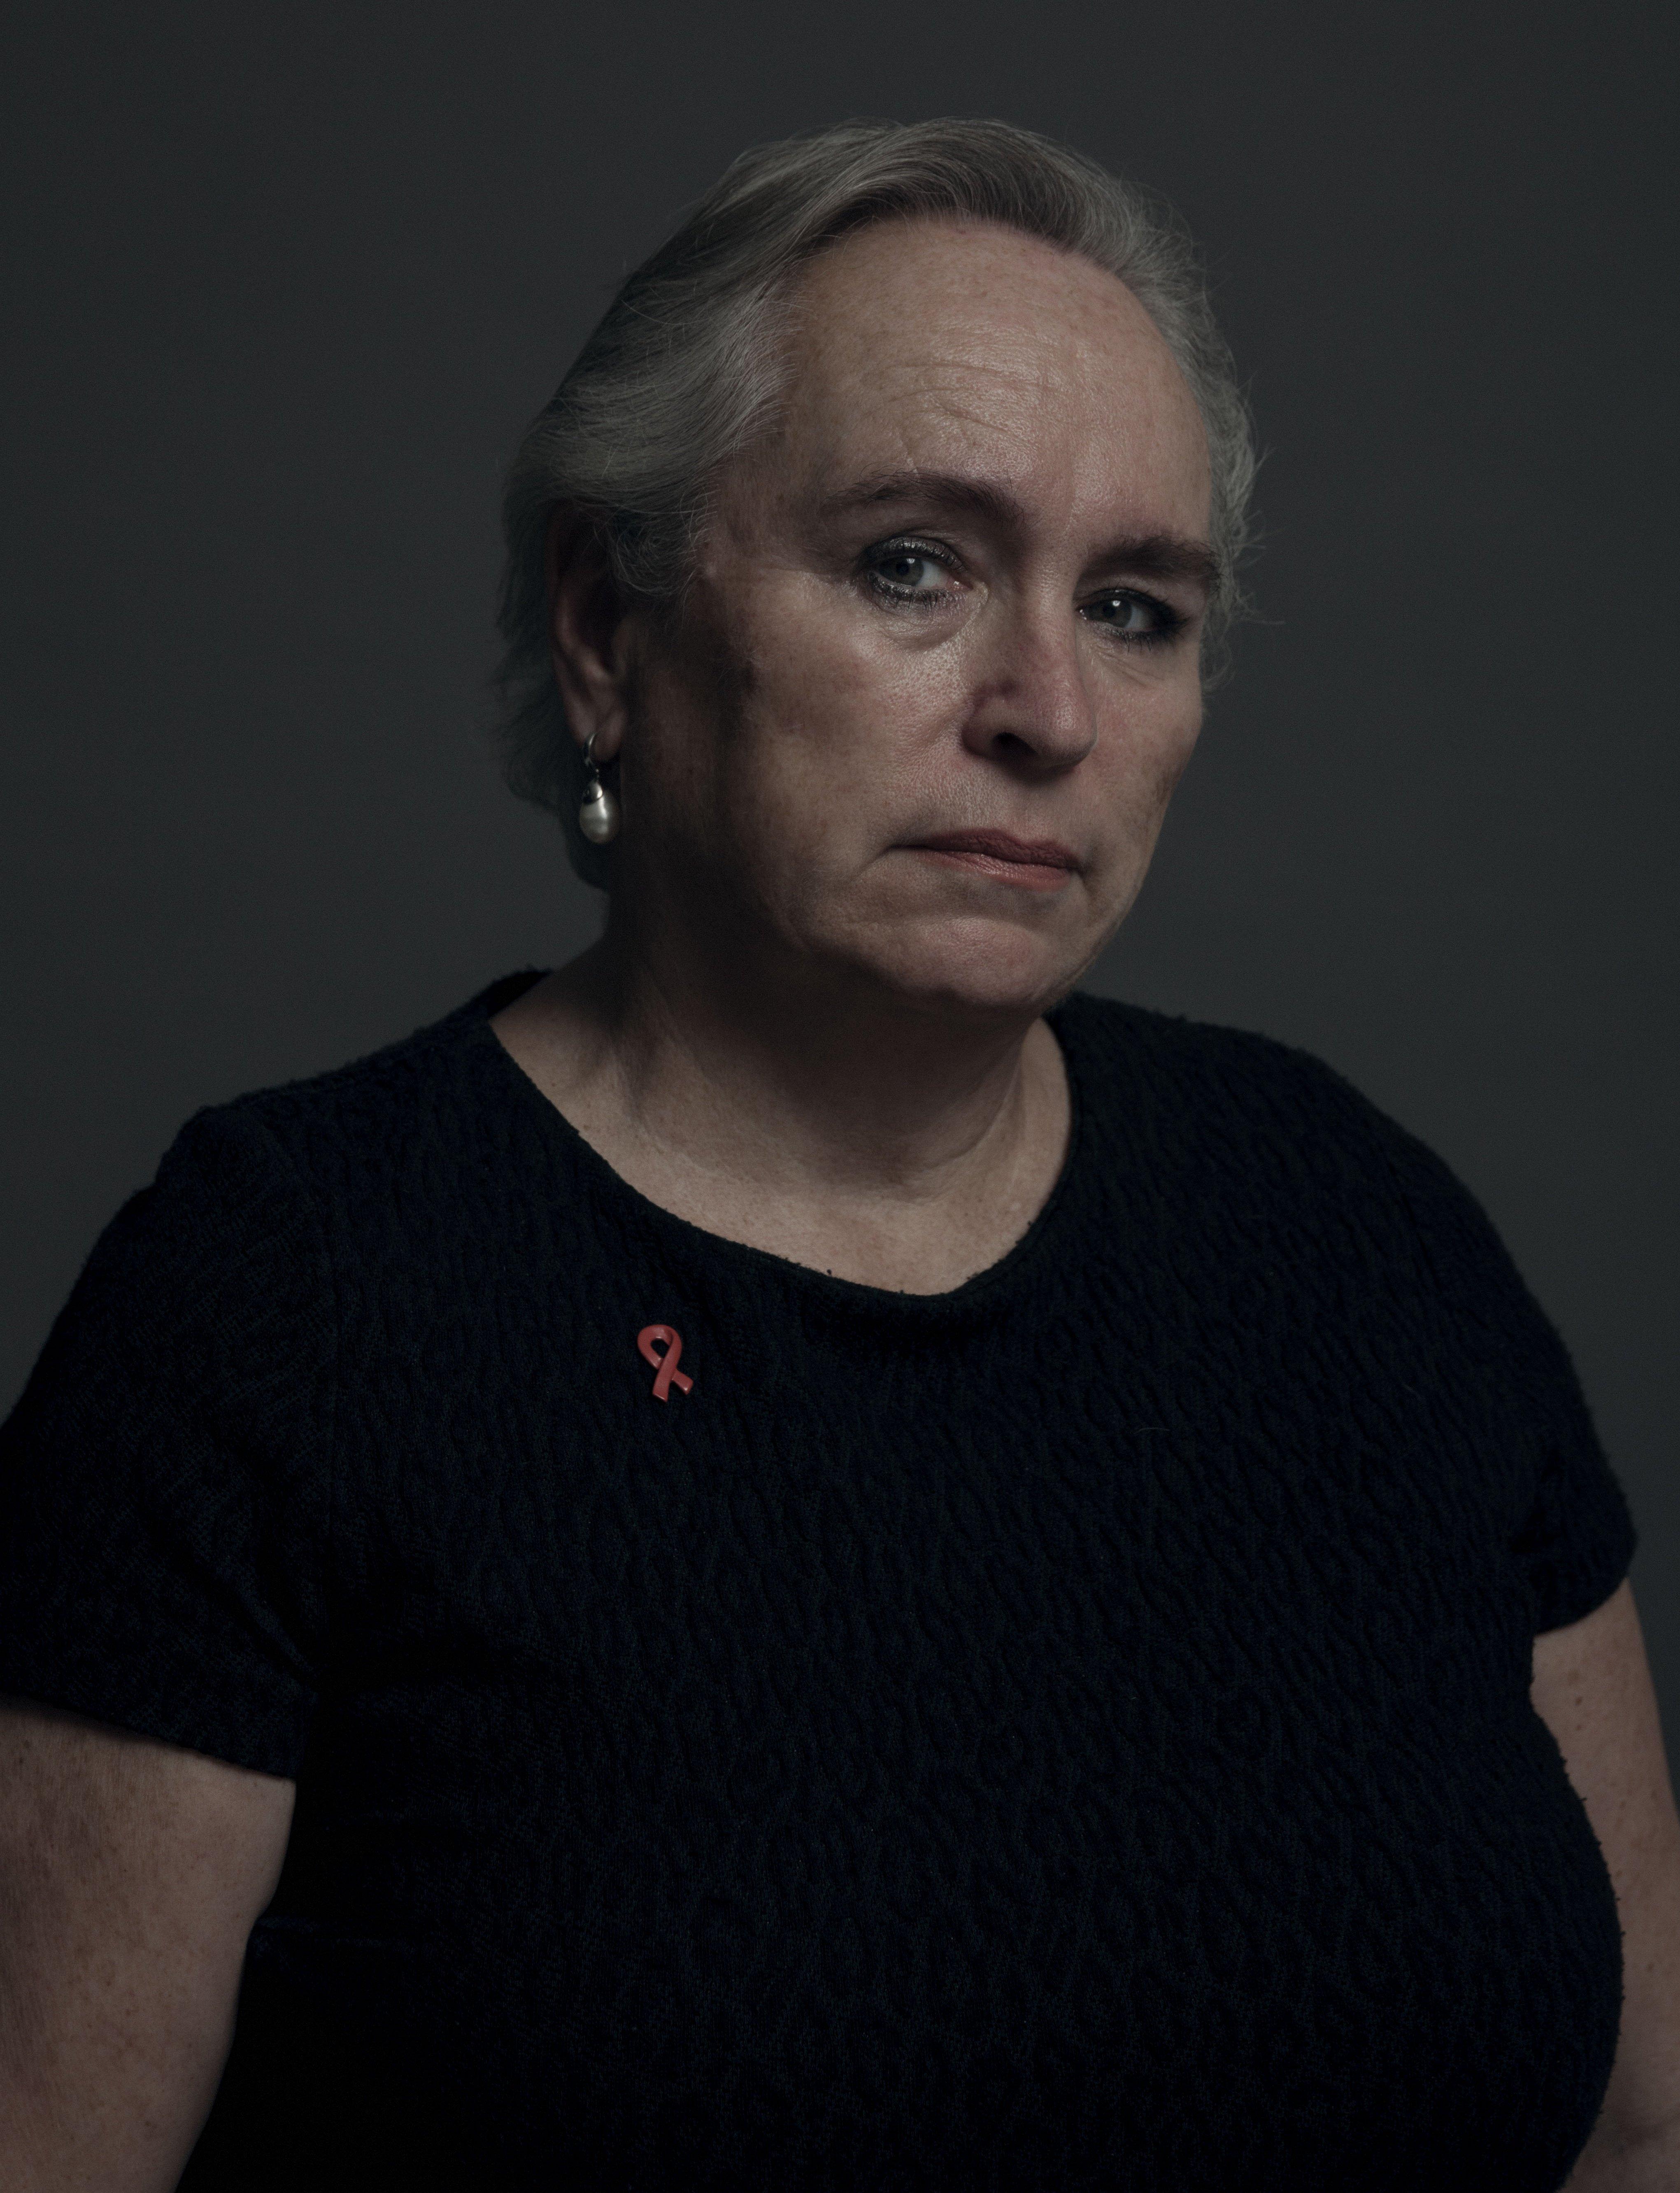 Nederland laat kansen liggen in hiv-bestrijding